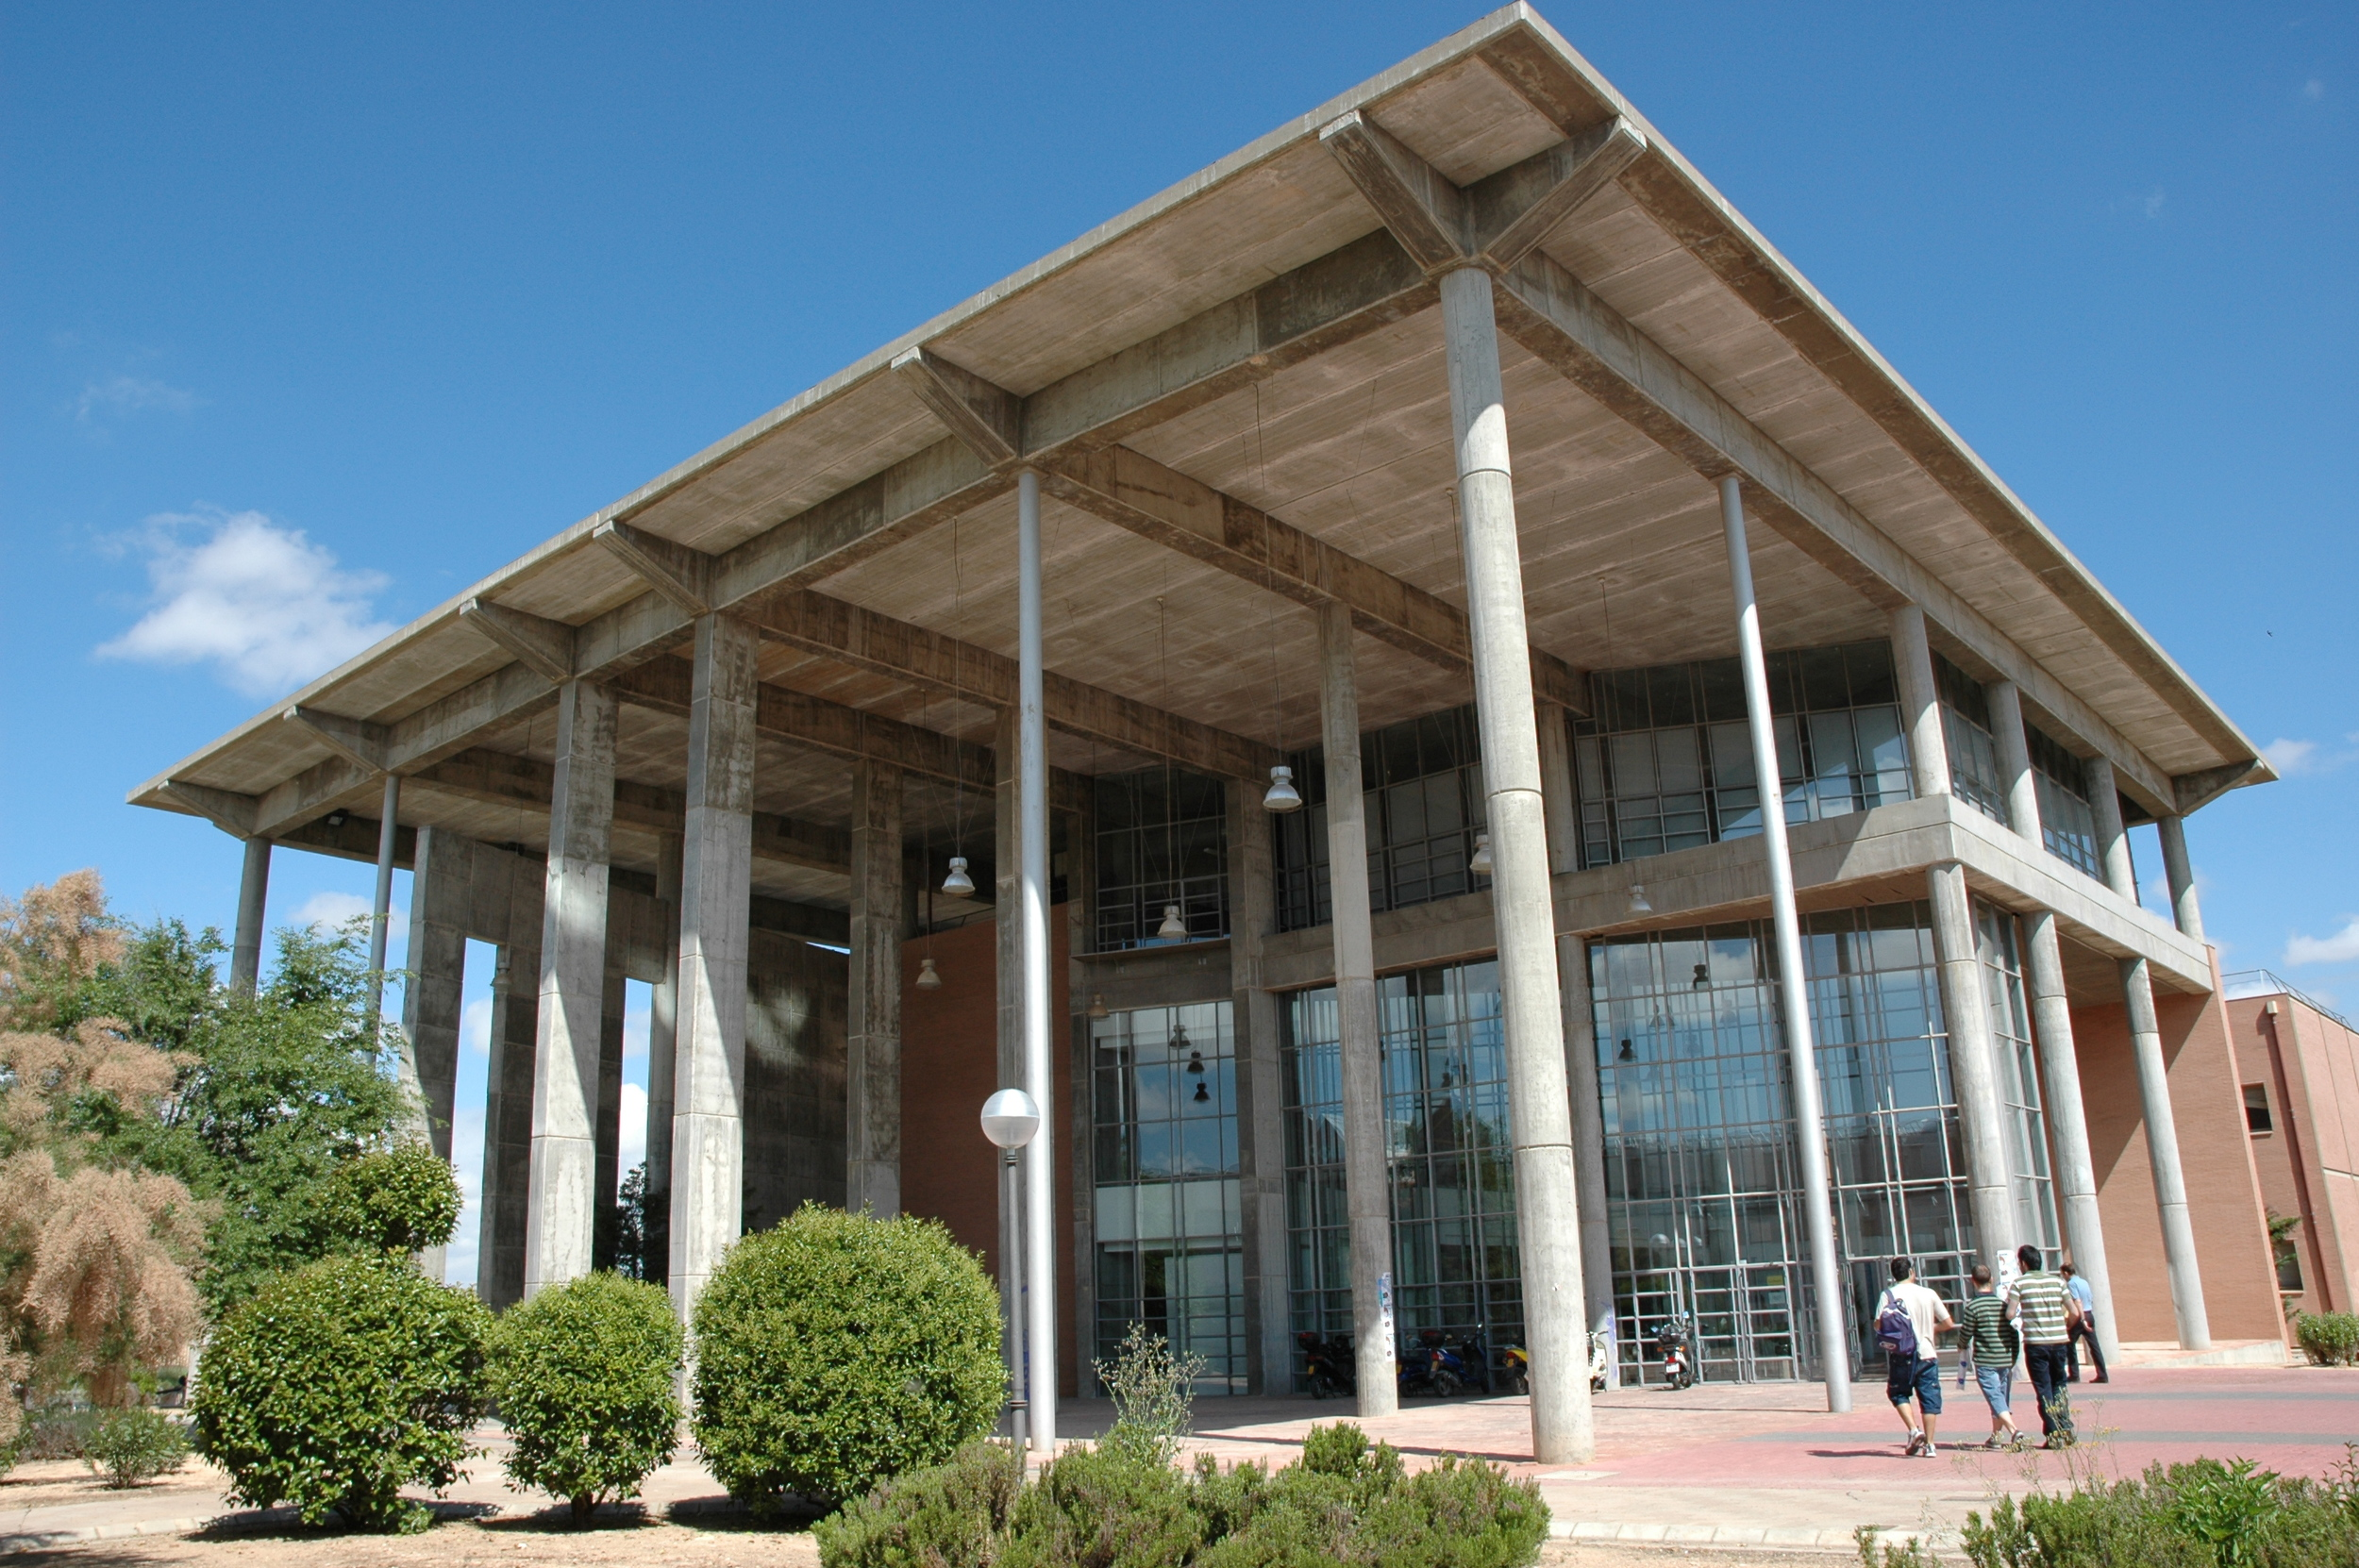 Building within University of Castilla La Mancha, Spain